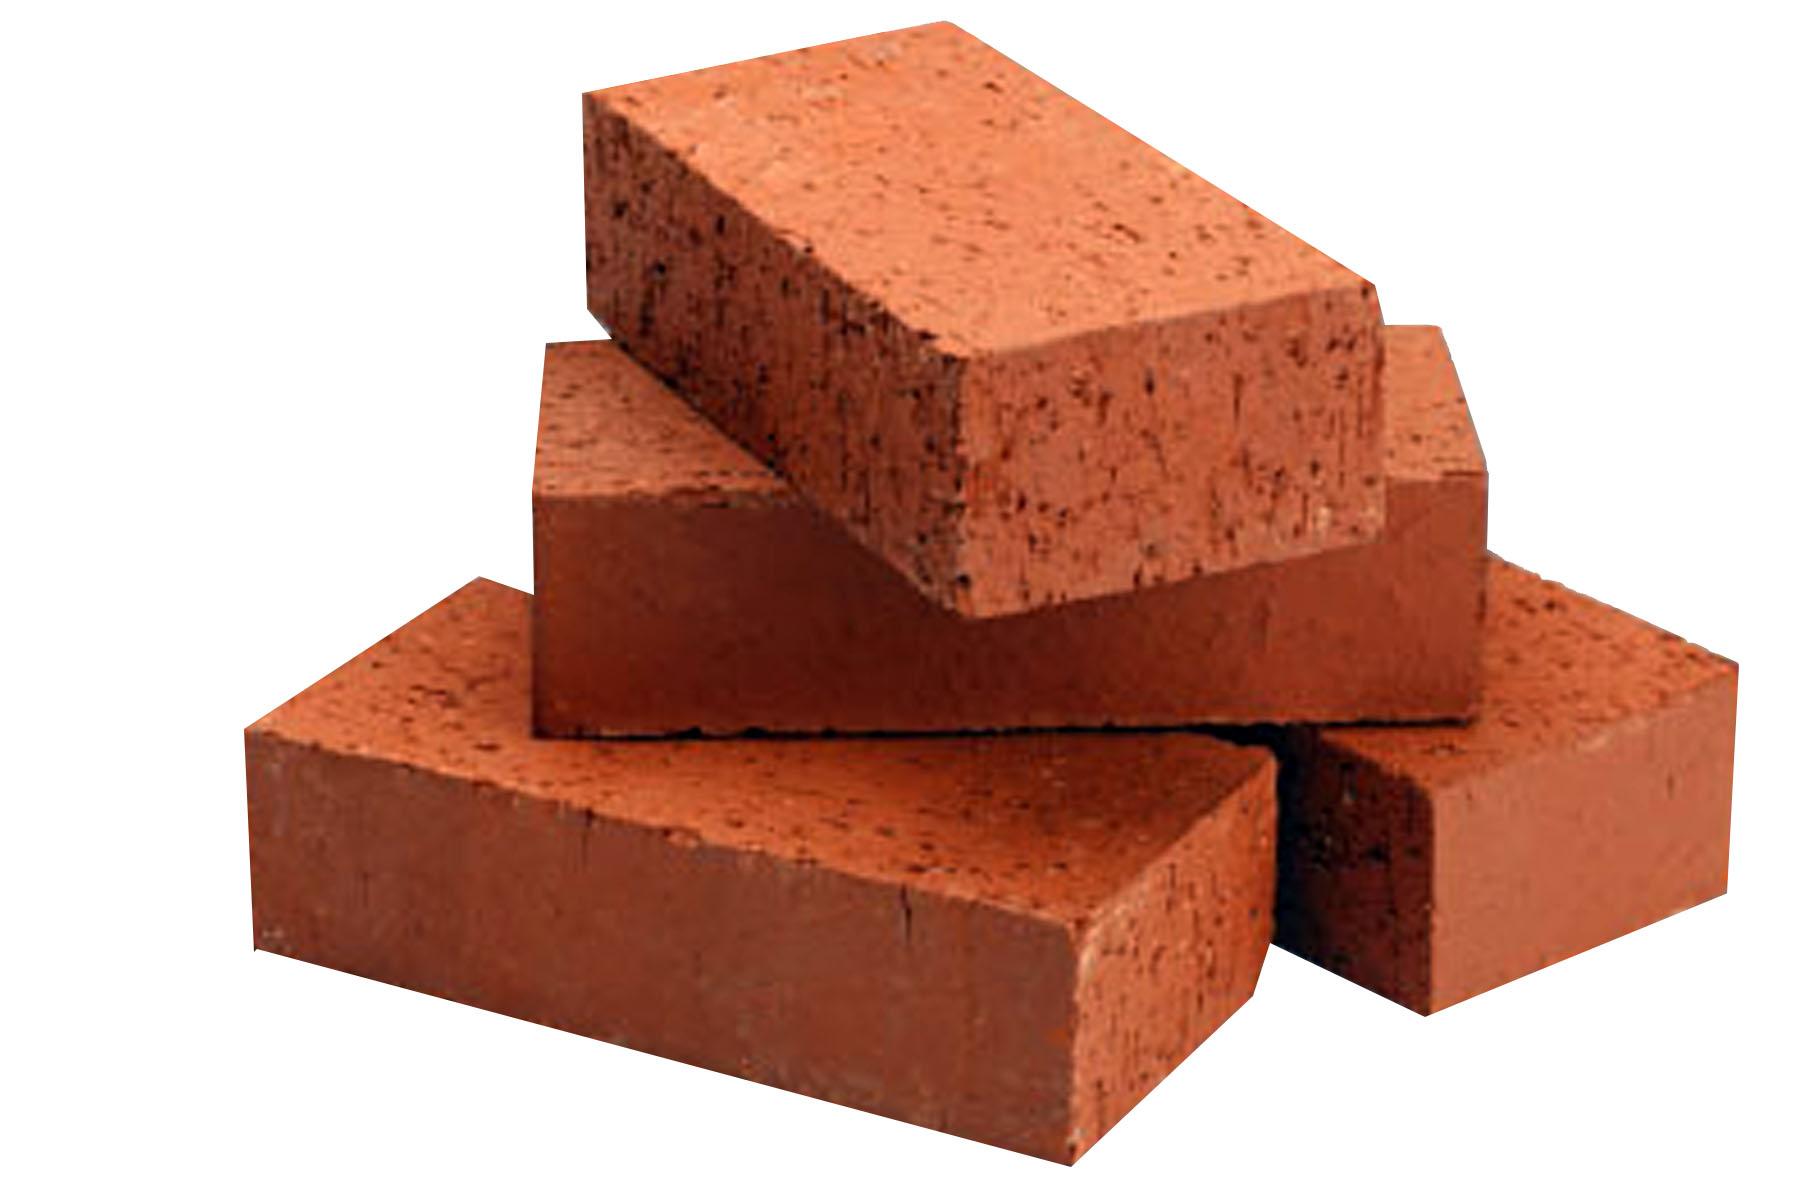 Brick clipart building construction material 81 Trade Materials Saba Building